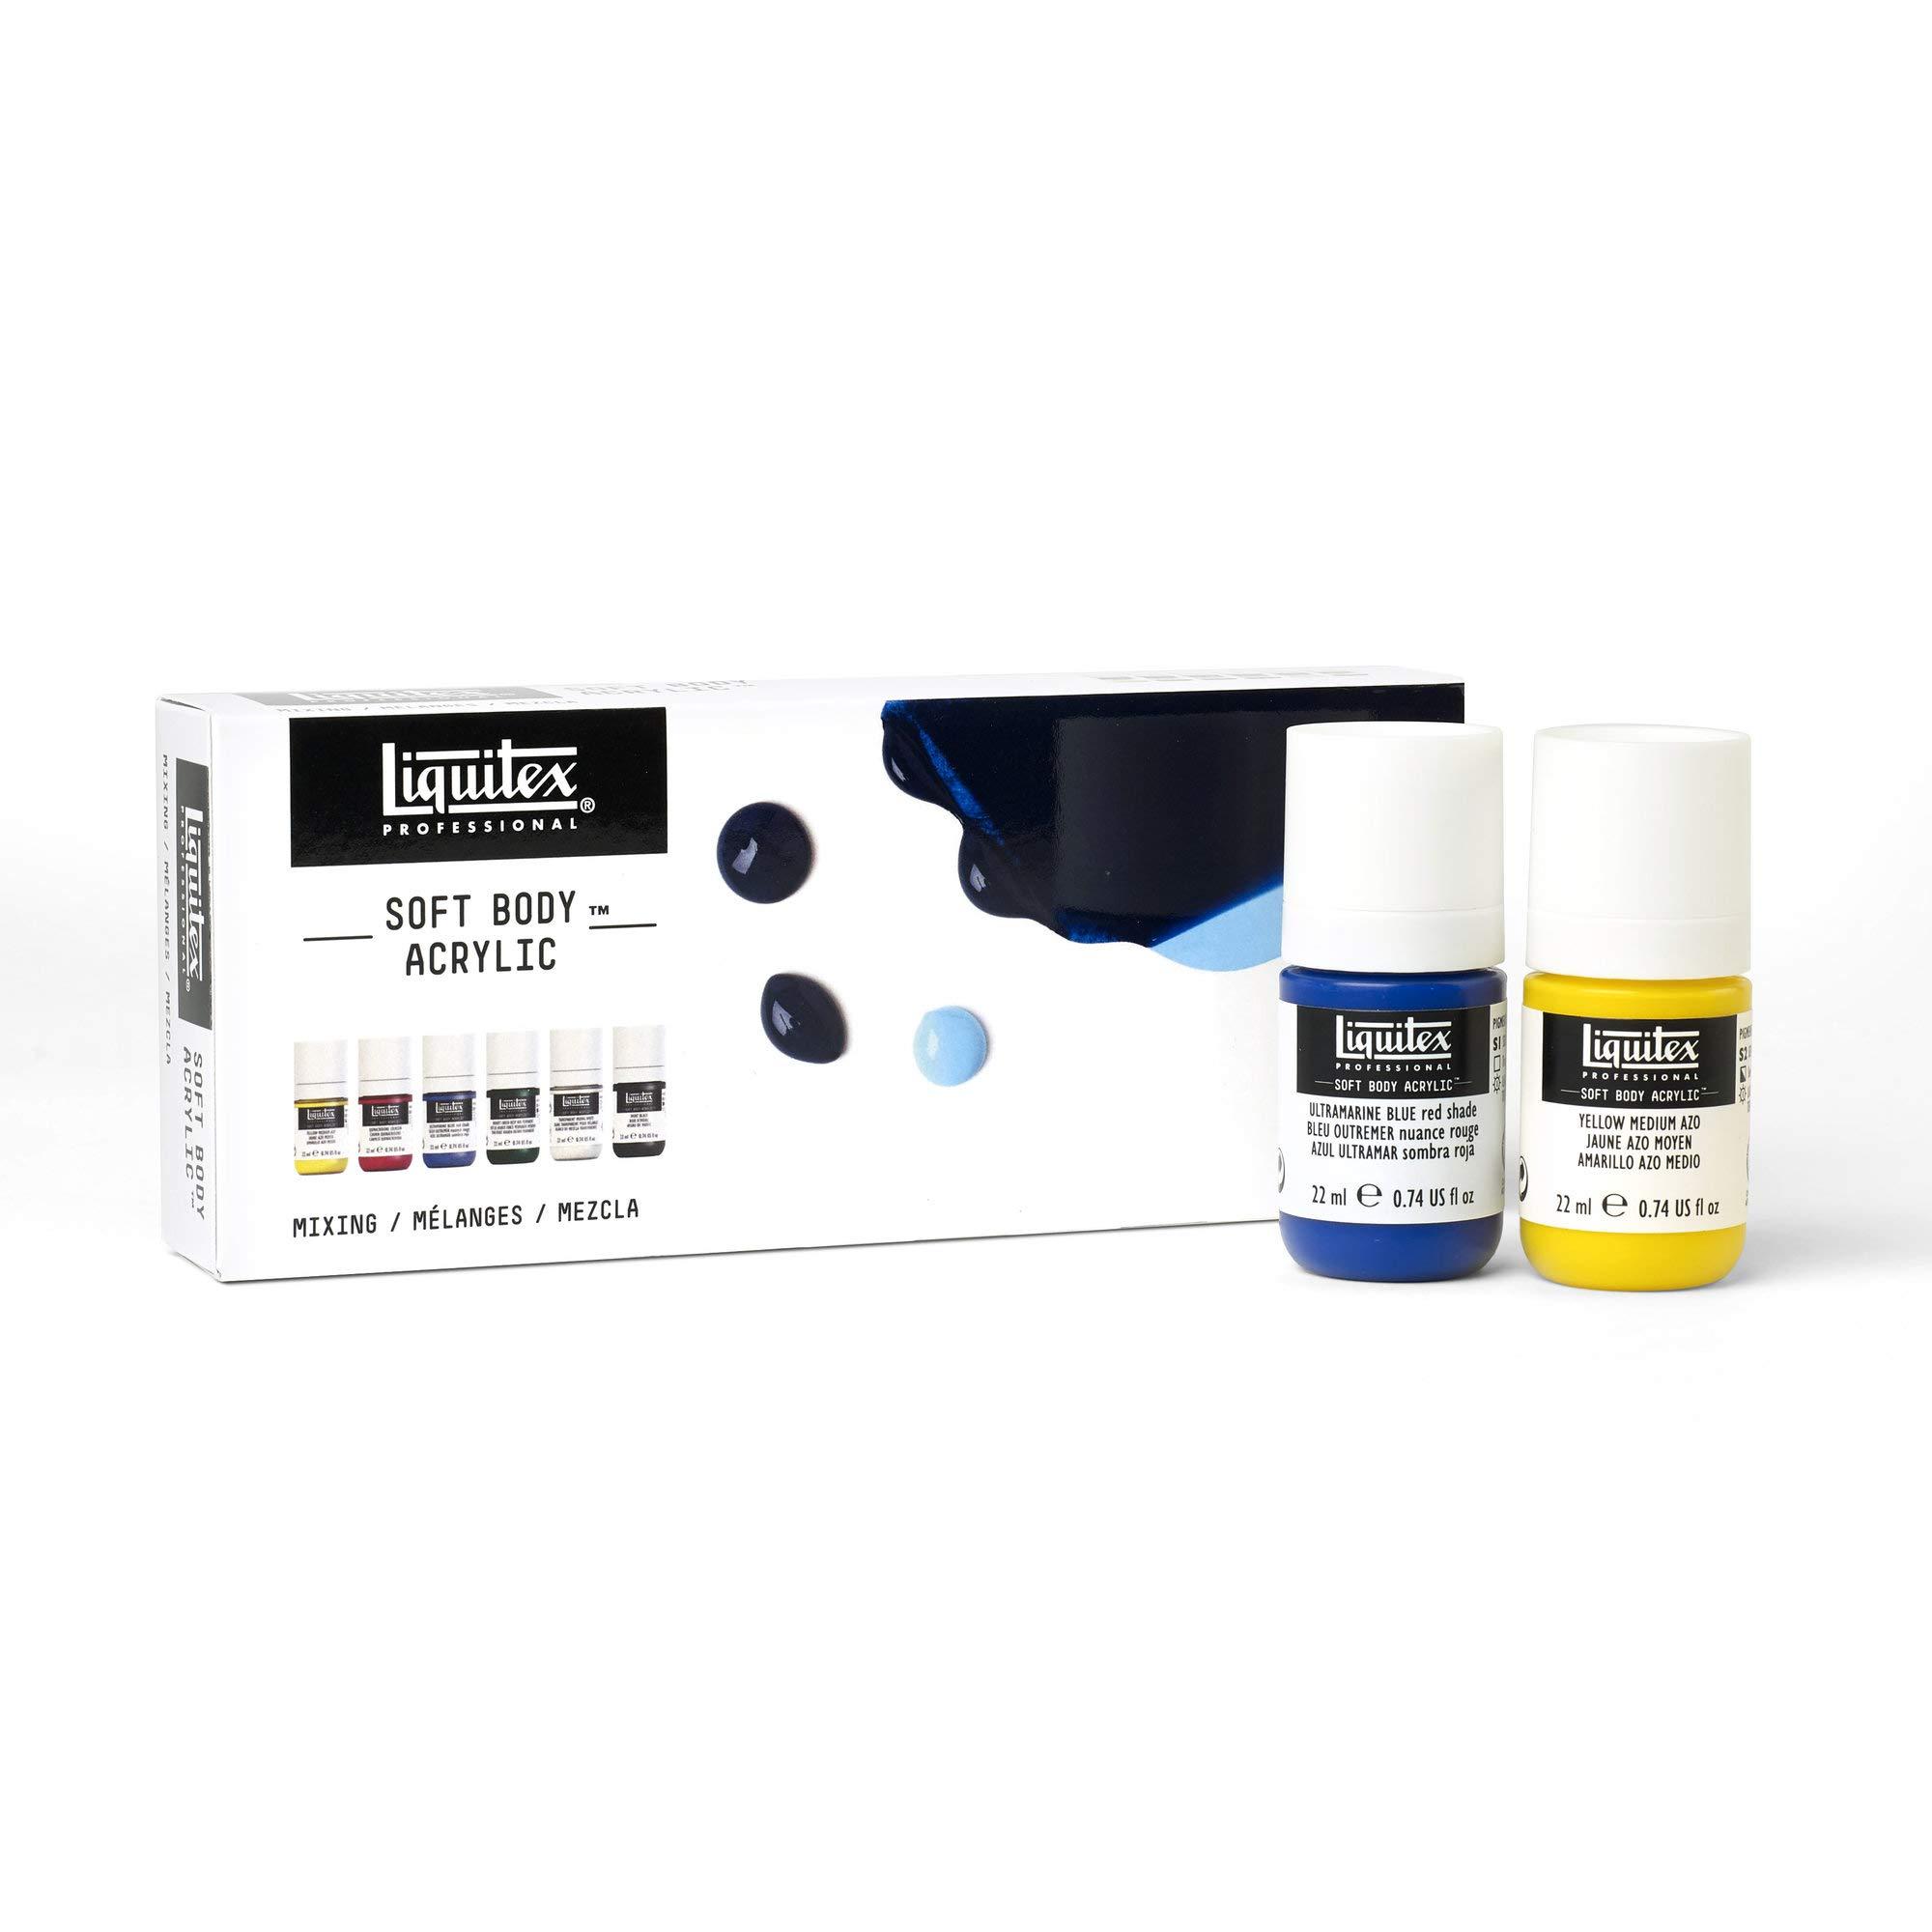 Liquitex Professional Soft Body Acrylic Paint, Mixing Set 22ml, 6 Colors, 4 Fl Oz